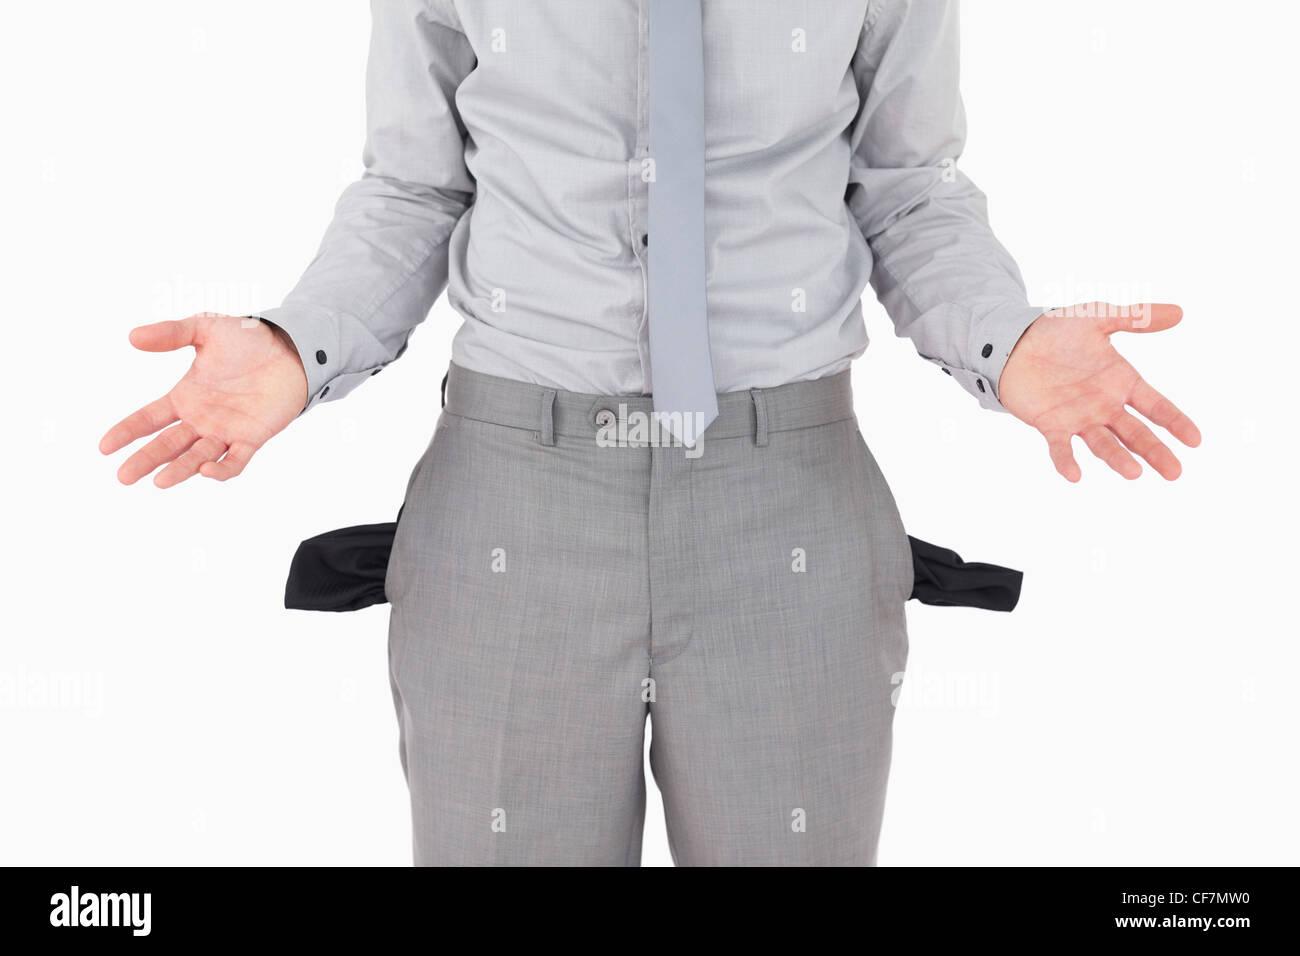 Broke businessman with empty pockets - Stock Image